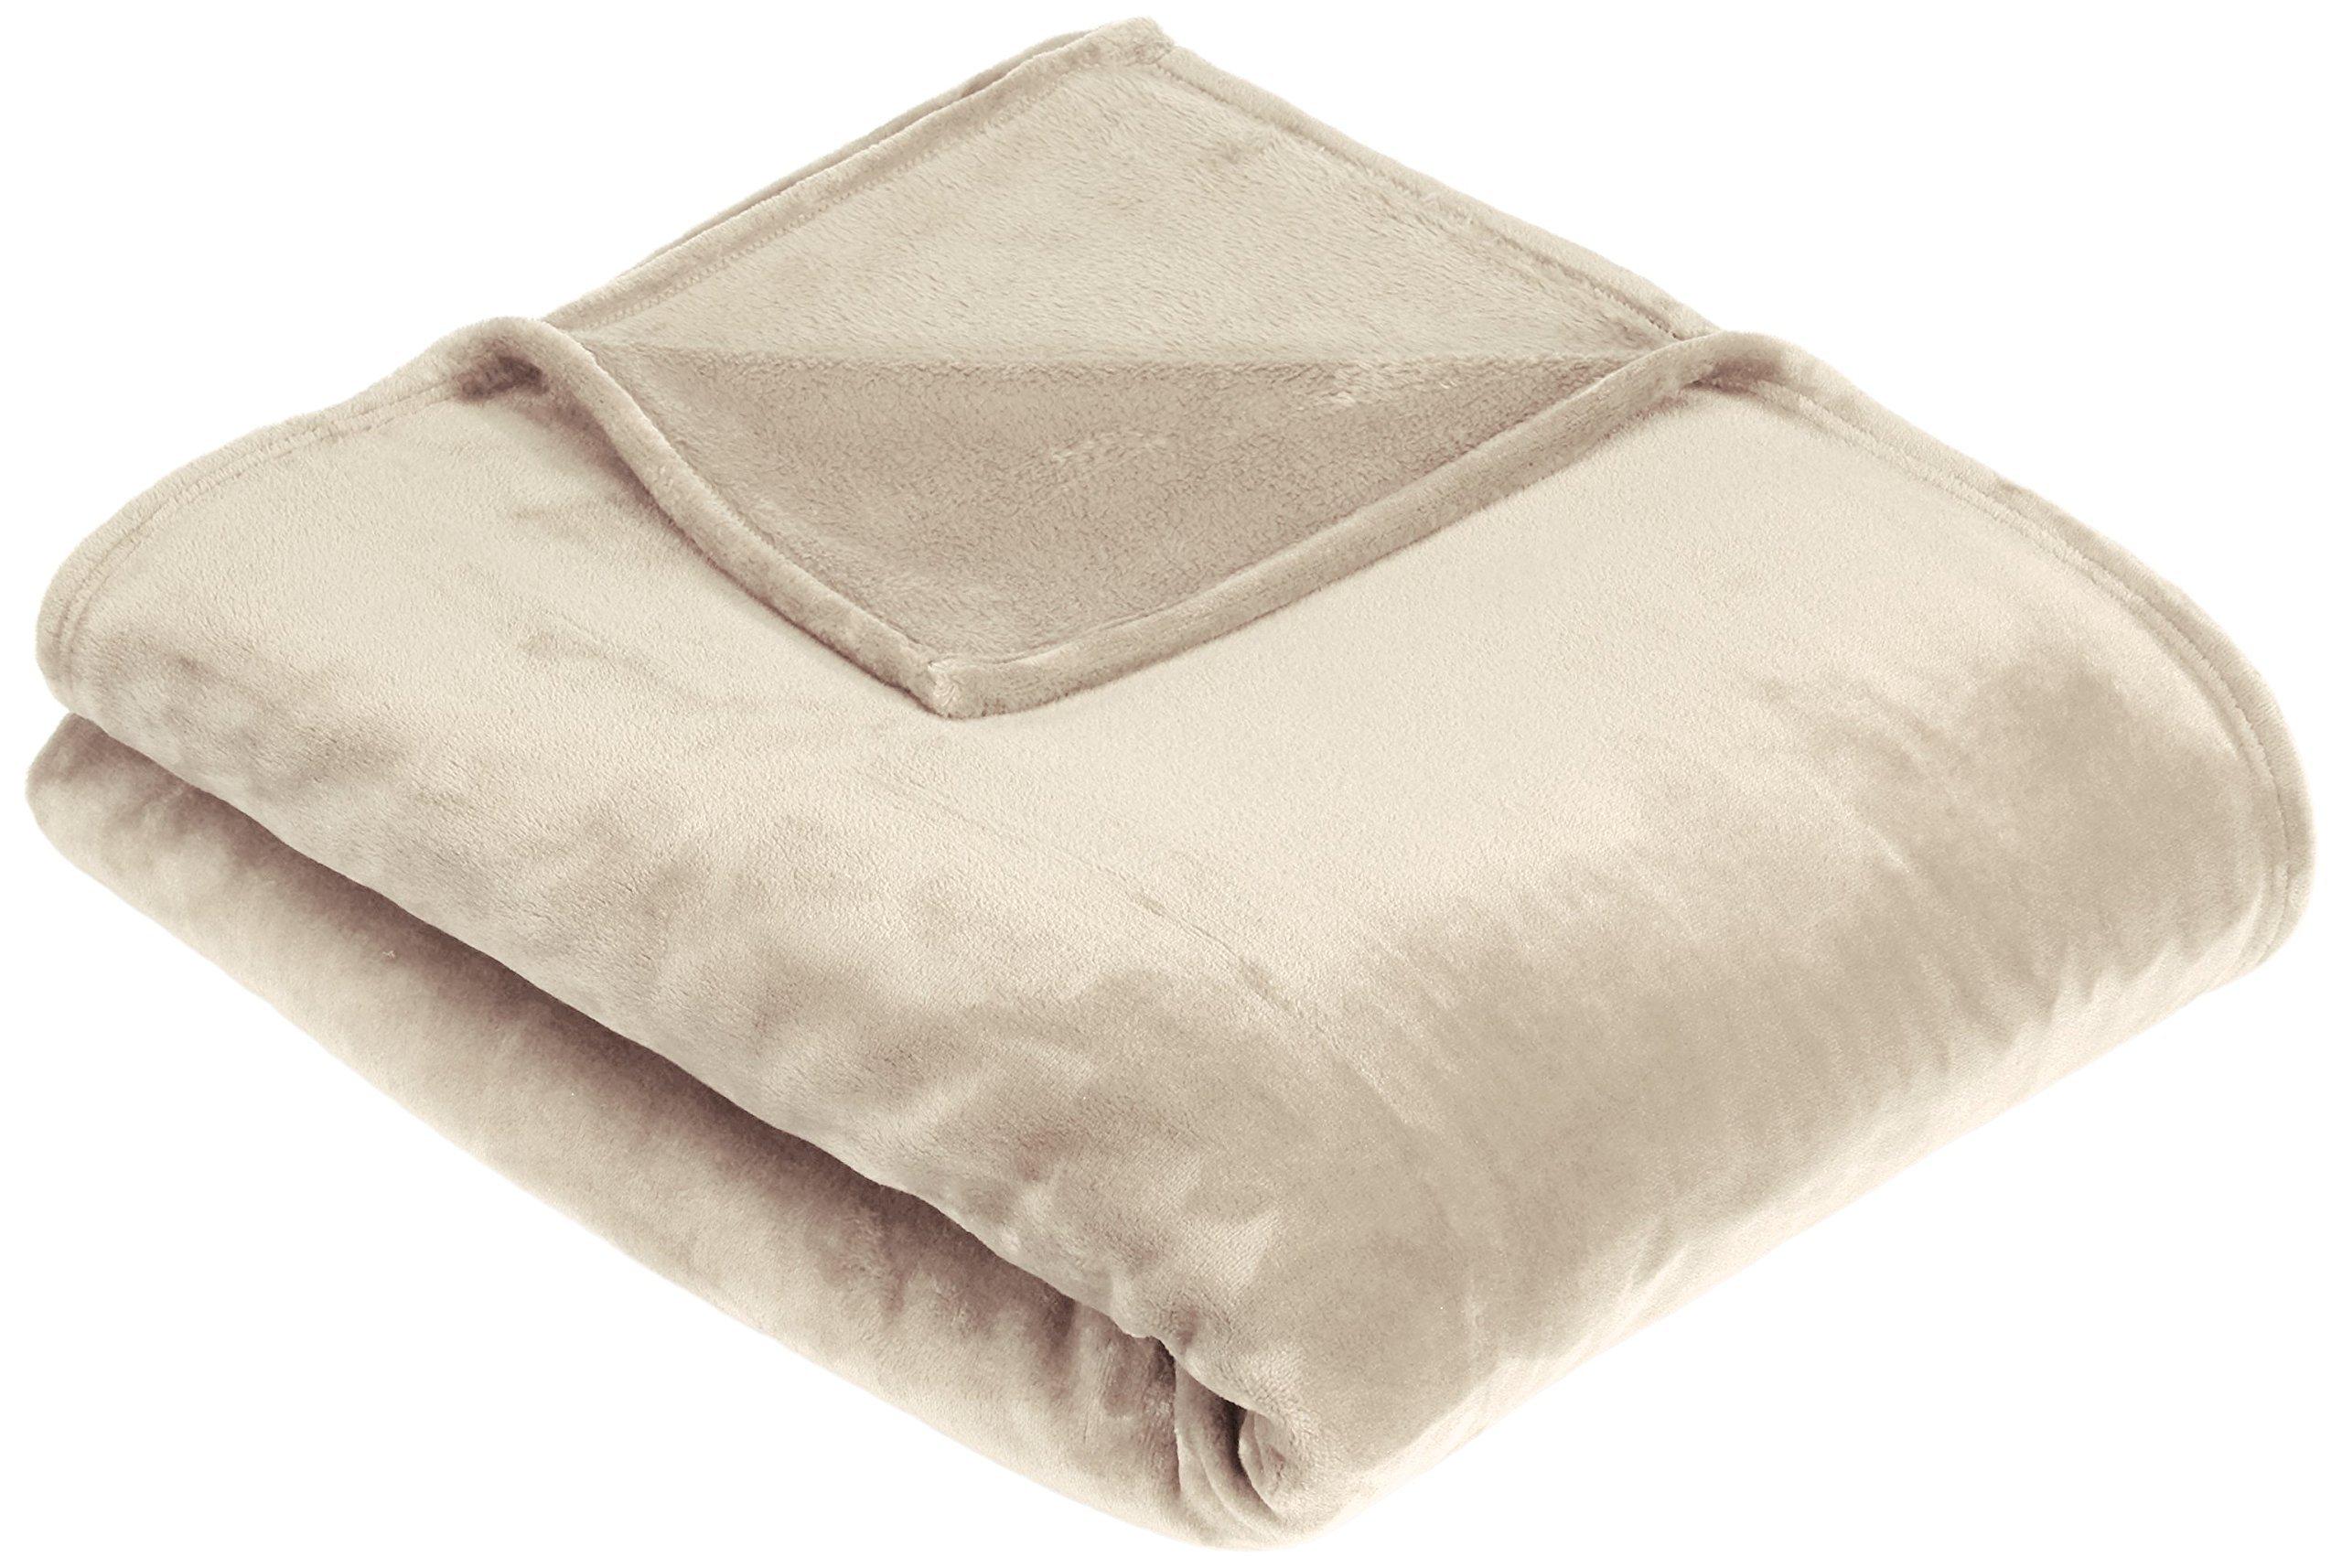 Pinzon Velvet Plush Throw Blanket, 50'' x 60'', Sand